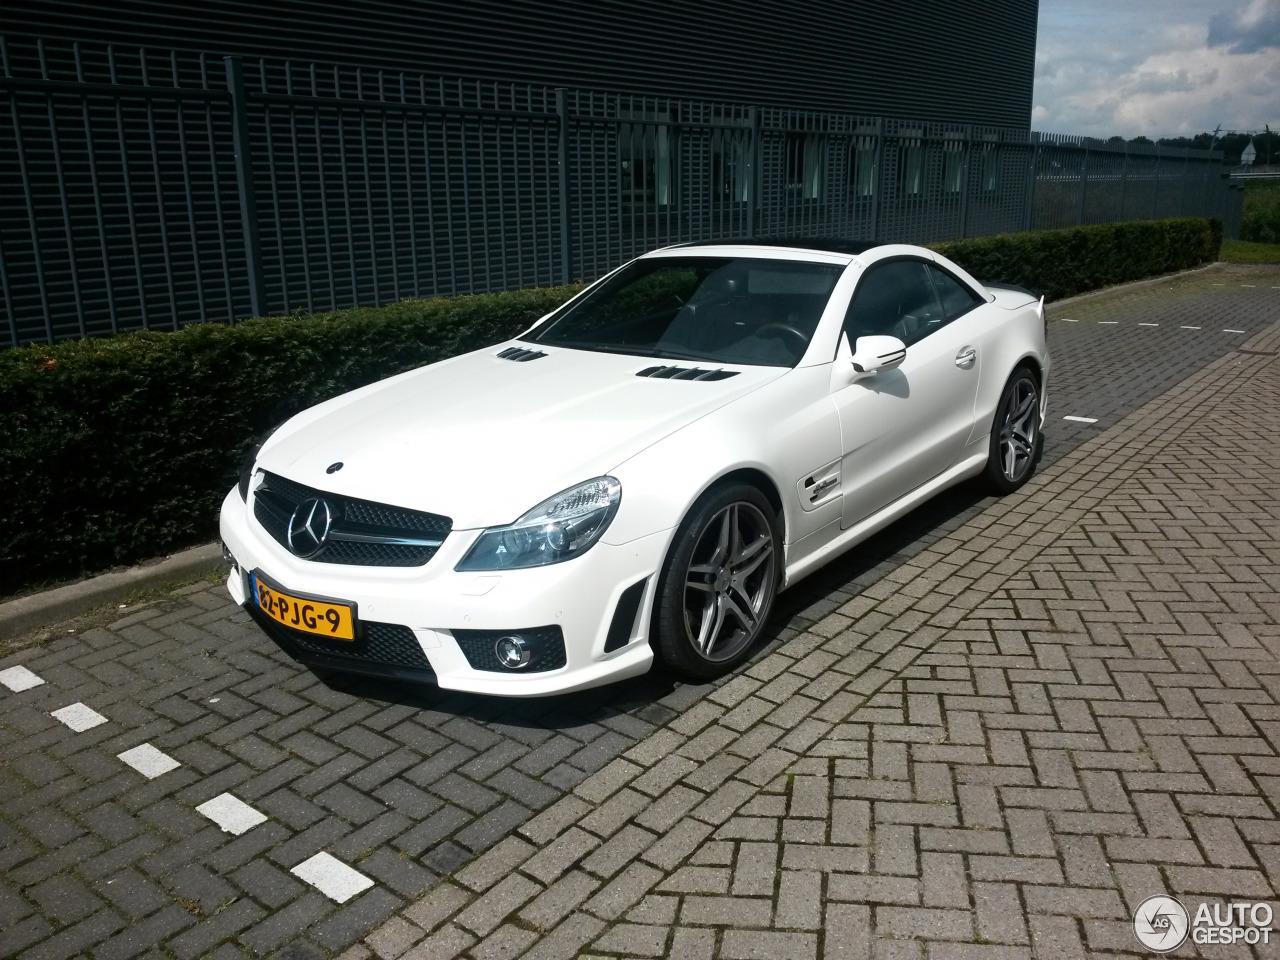 Mercedes benz sl 63 amg edition iwc 9 september 2014 for Mercedes benz sl 2014